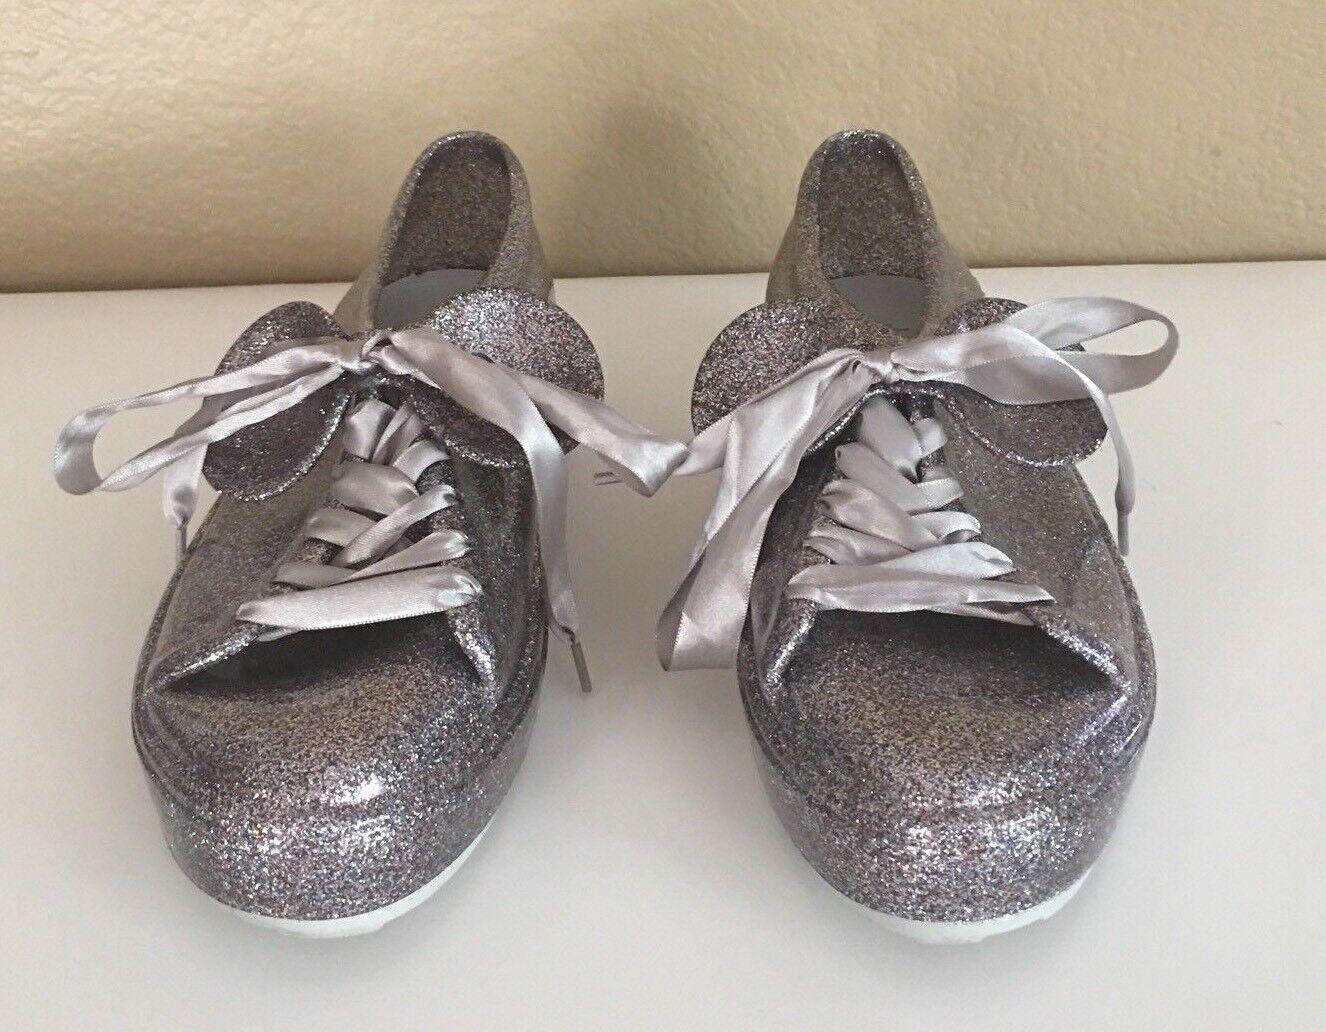 Melissa Be Disney Mouse Ears Sneakers Sneakers Sneakers shoes Silver Cloud Glitter Size 8 US 39 EU e5c17c